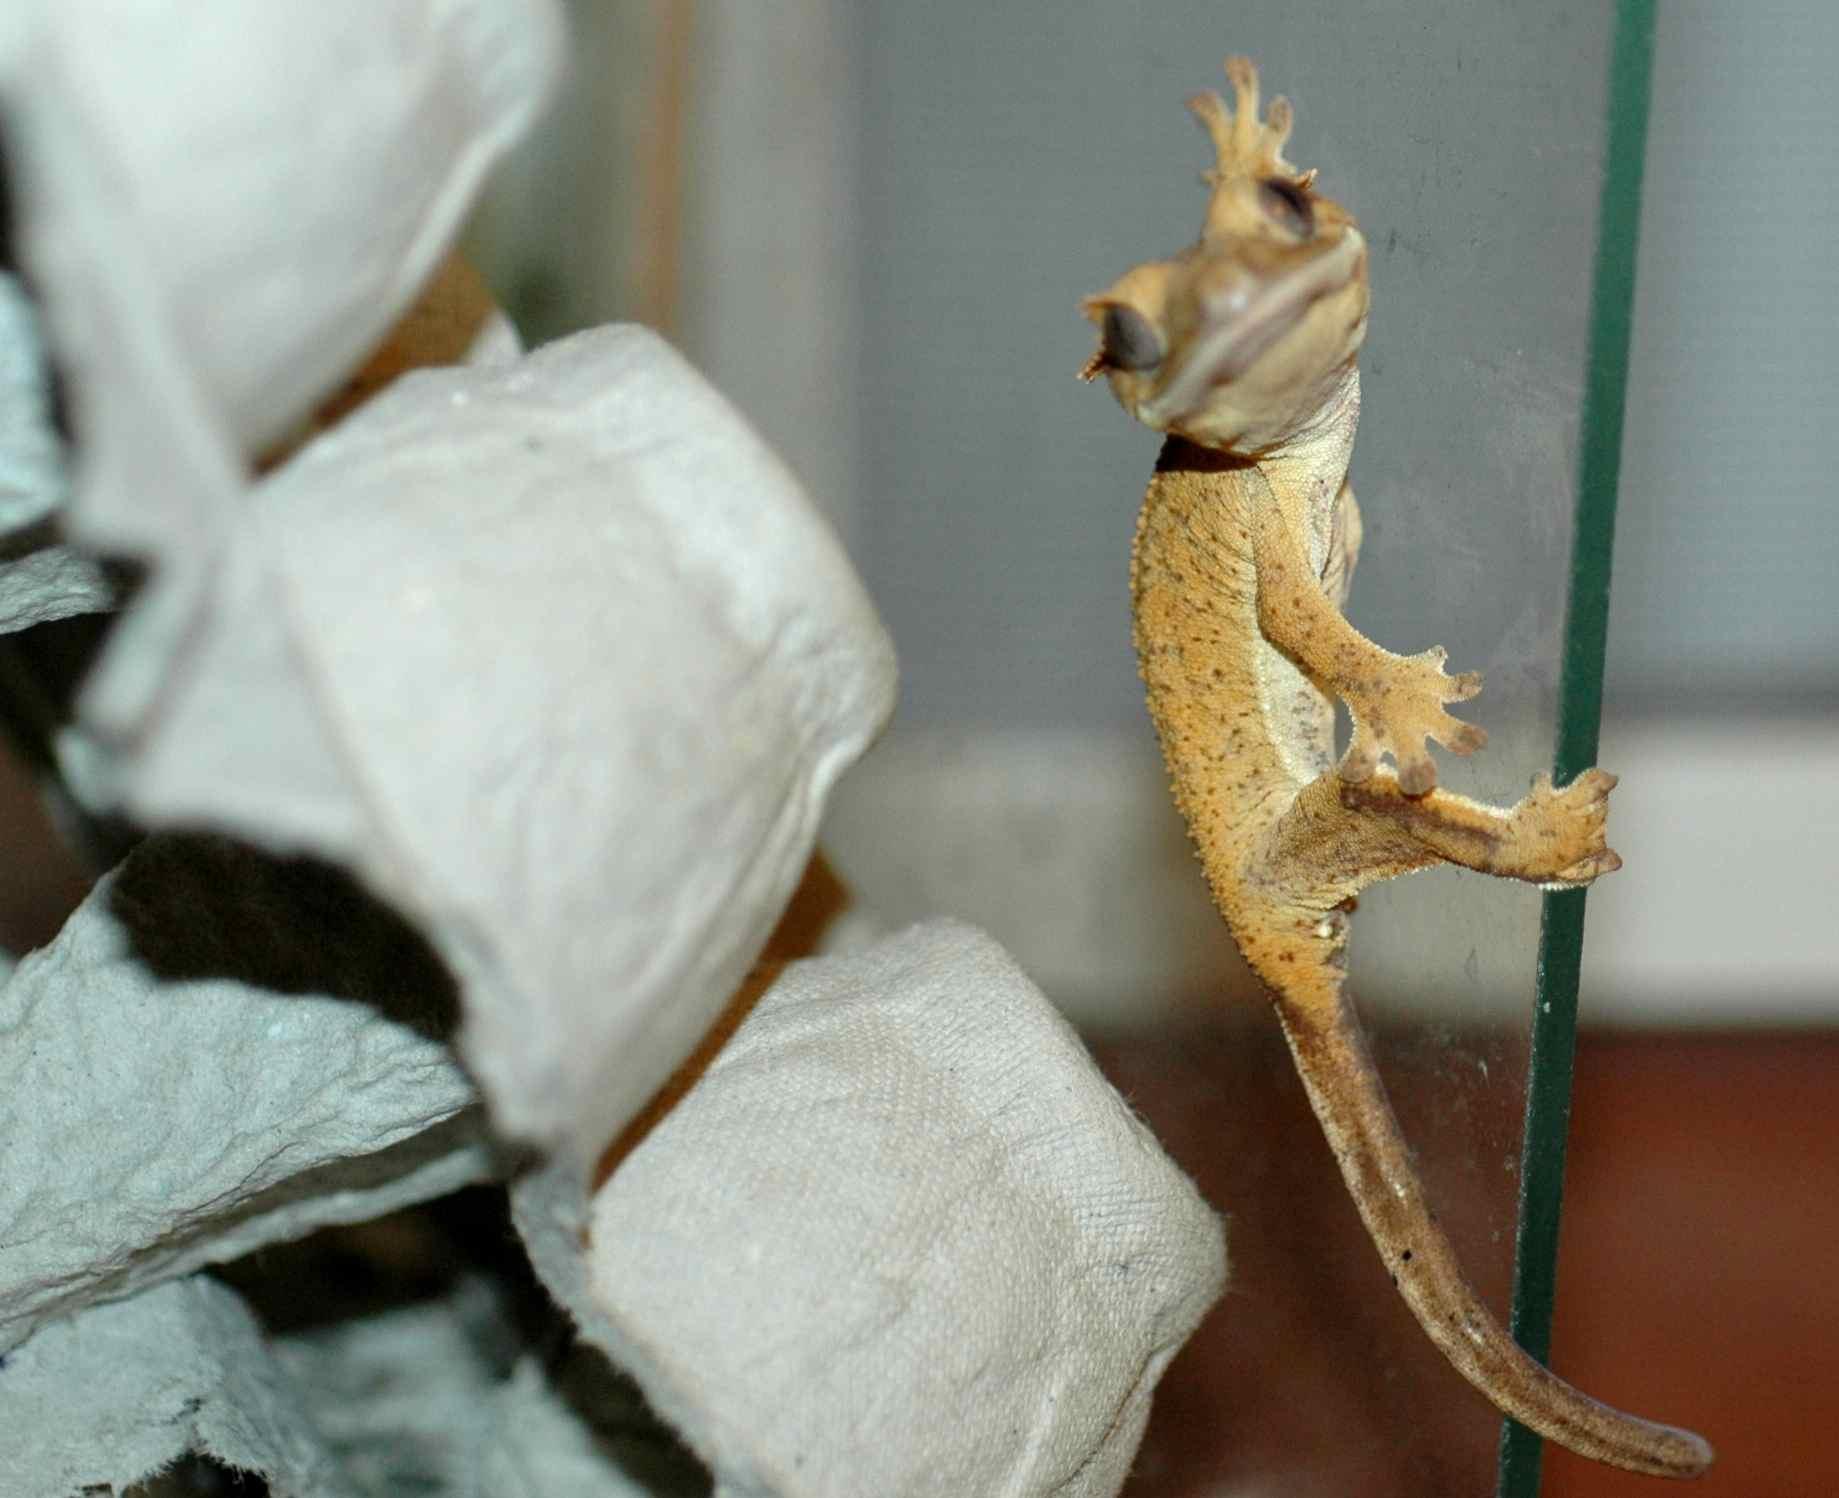 how do geckos stick tough little birds